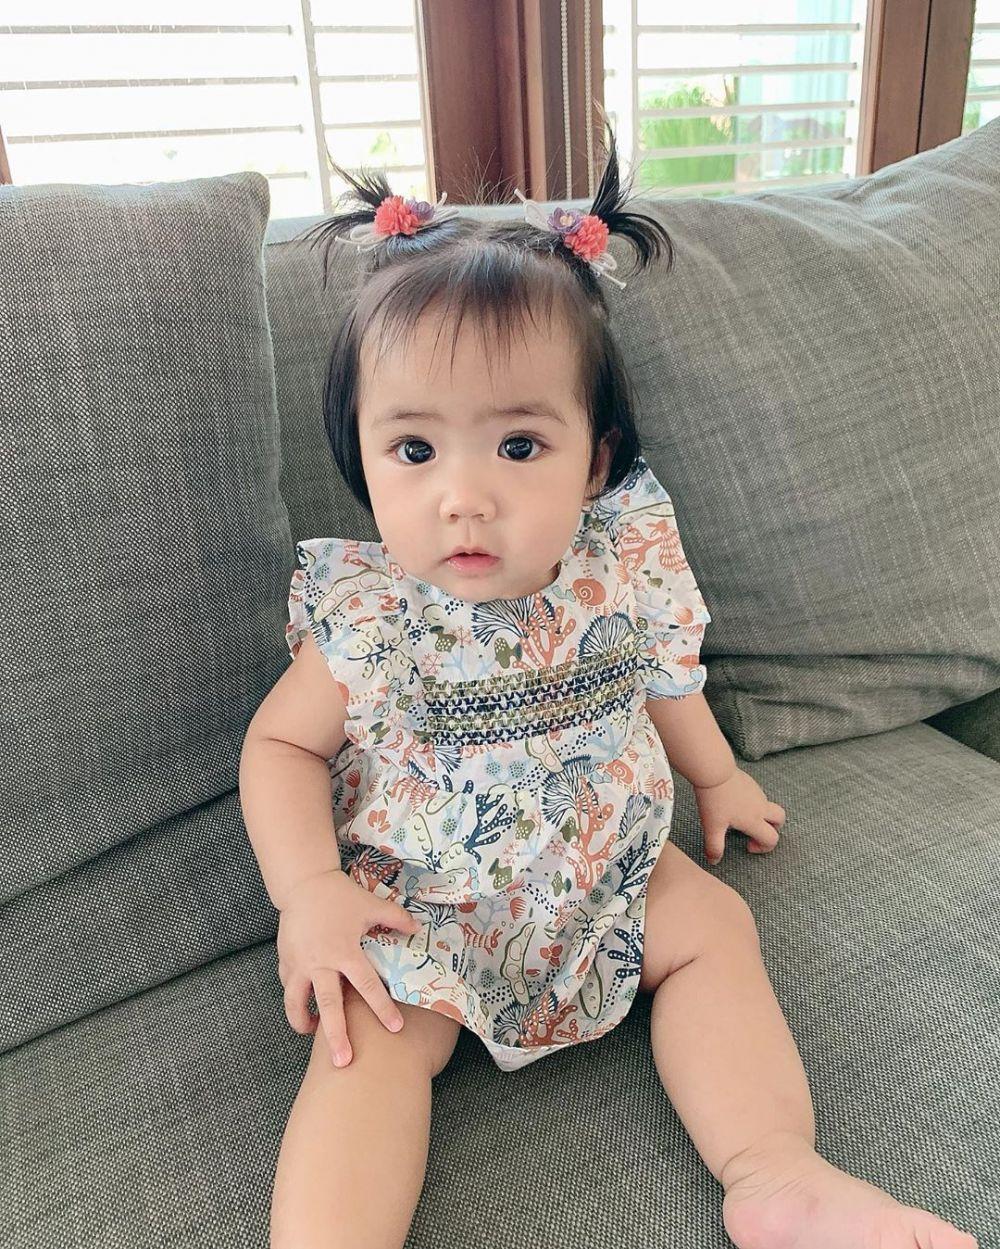 anak Momo Geisha dengan rambut kuncir air mancur © 2020 brilio.net